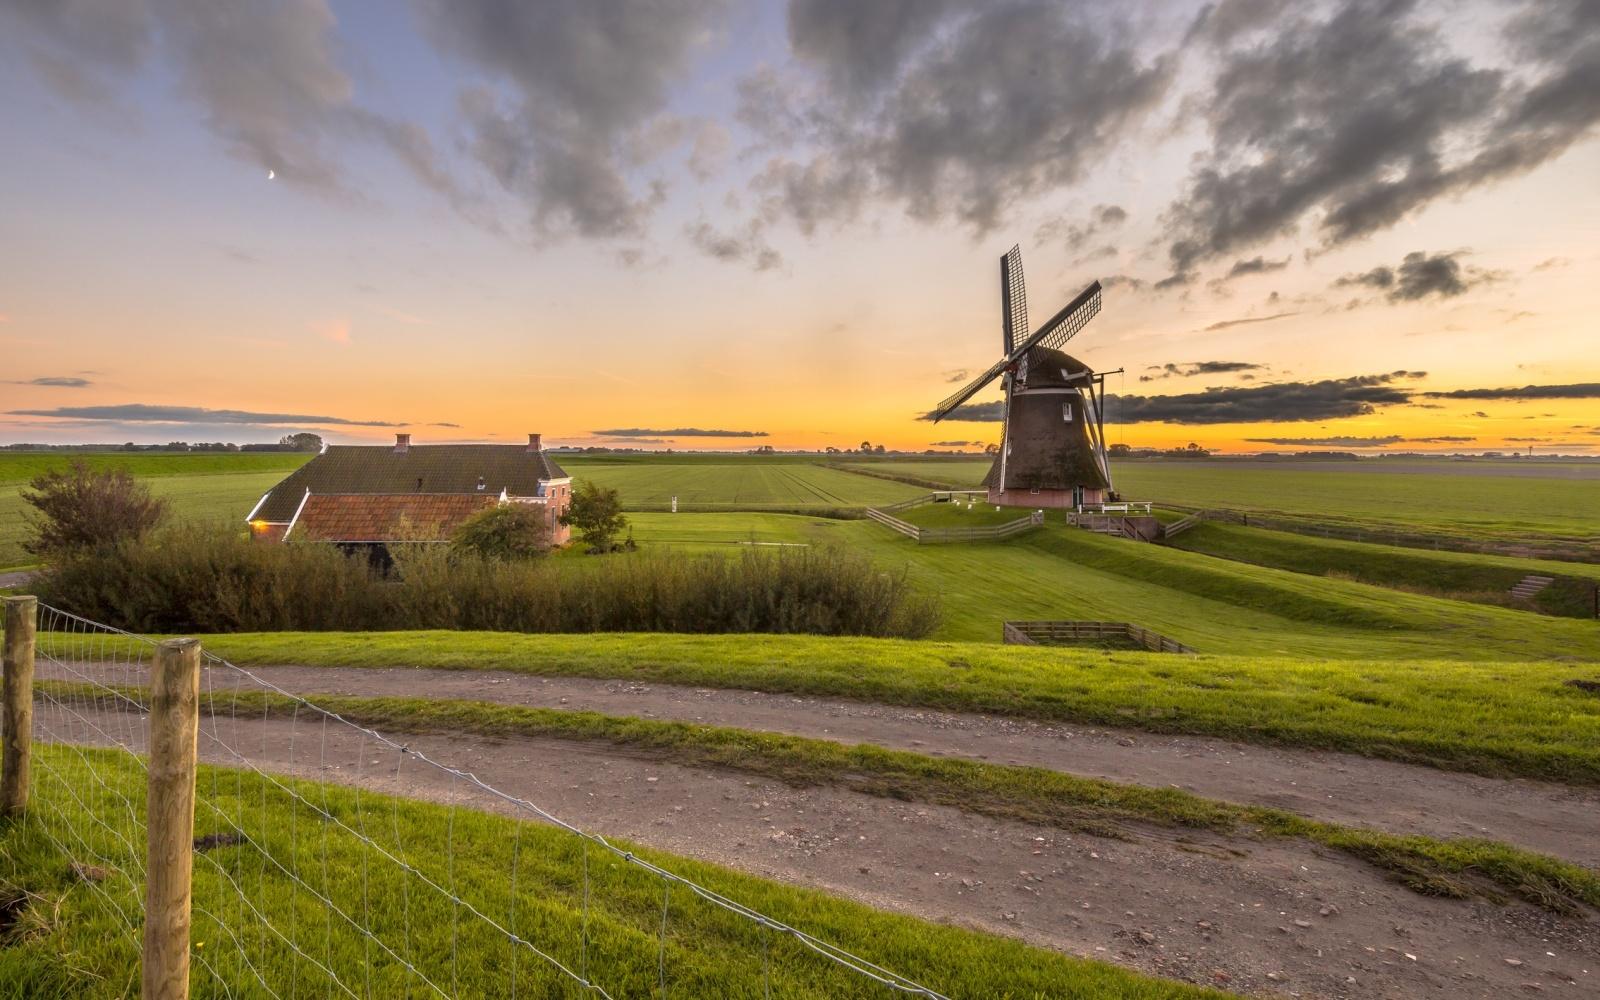 Holland Niederlande Nostalgie Retro Oldtimer Vintage Historie Dampfzug Segelschiff